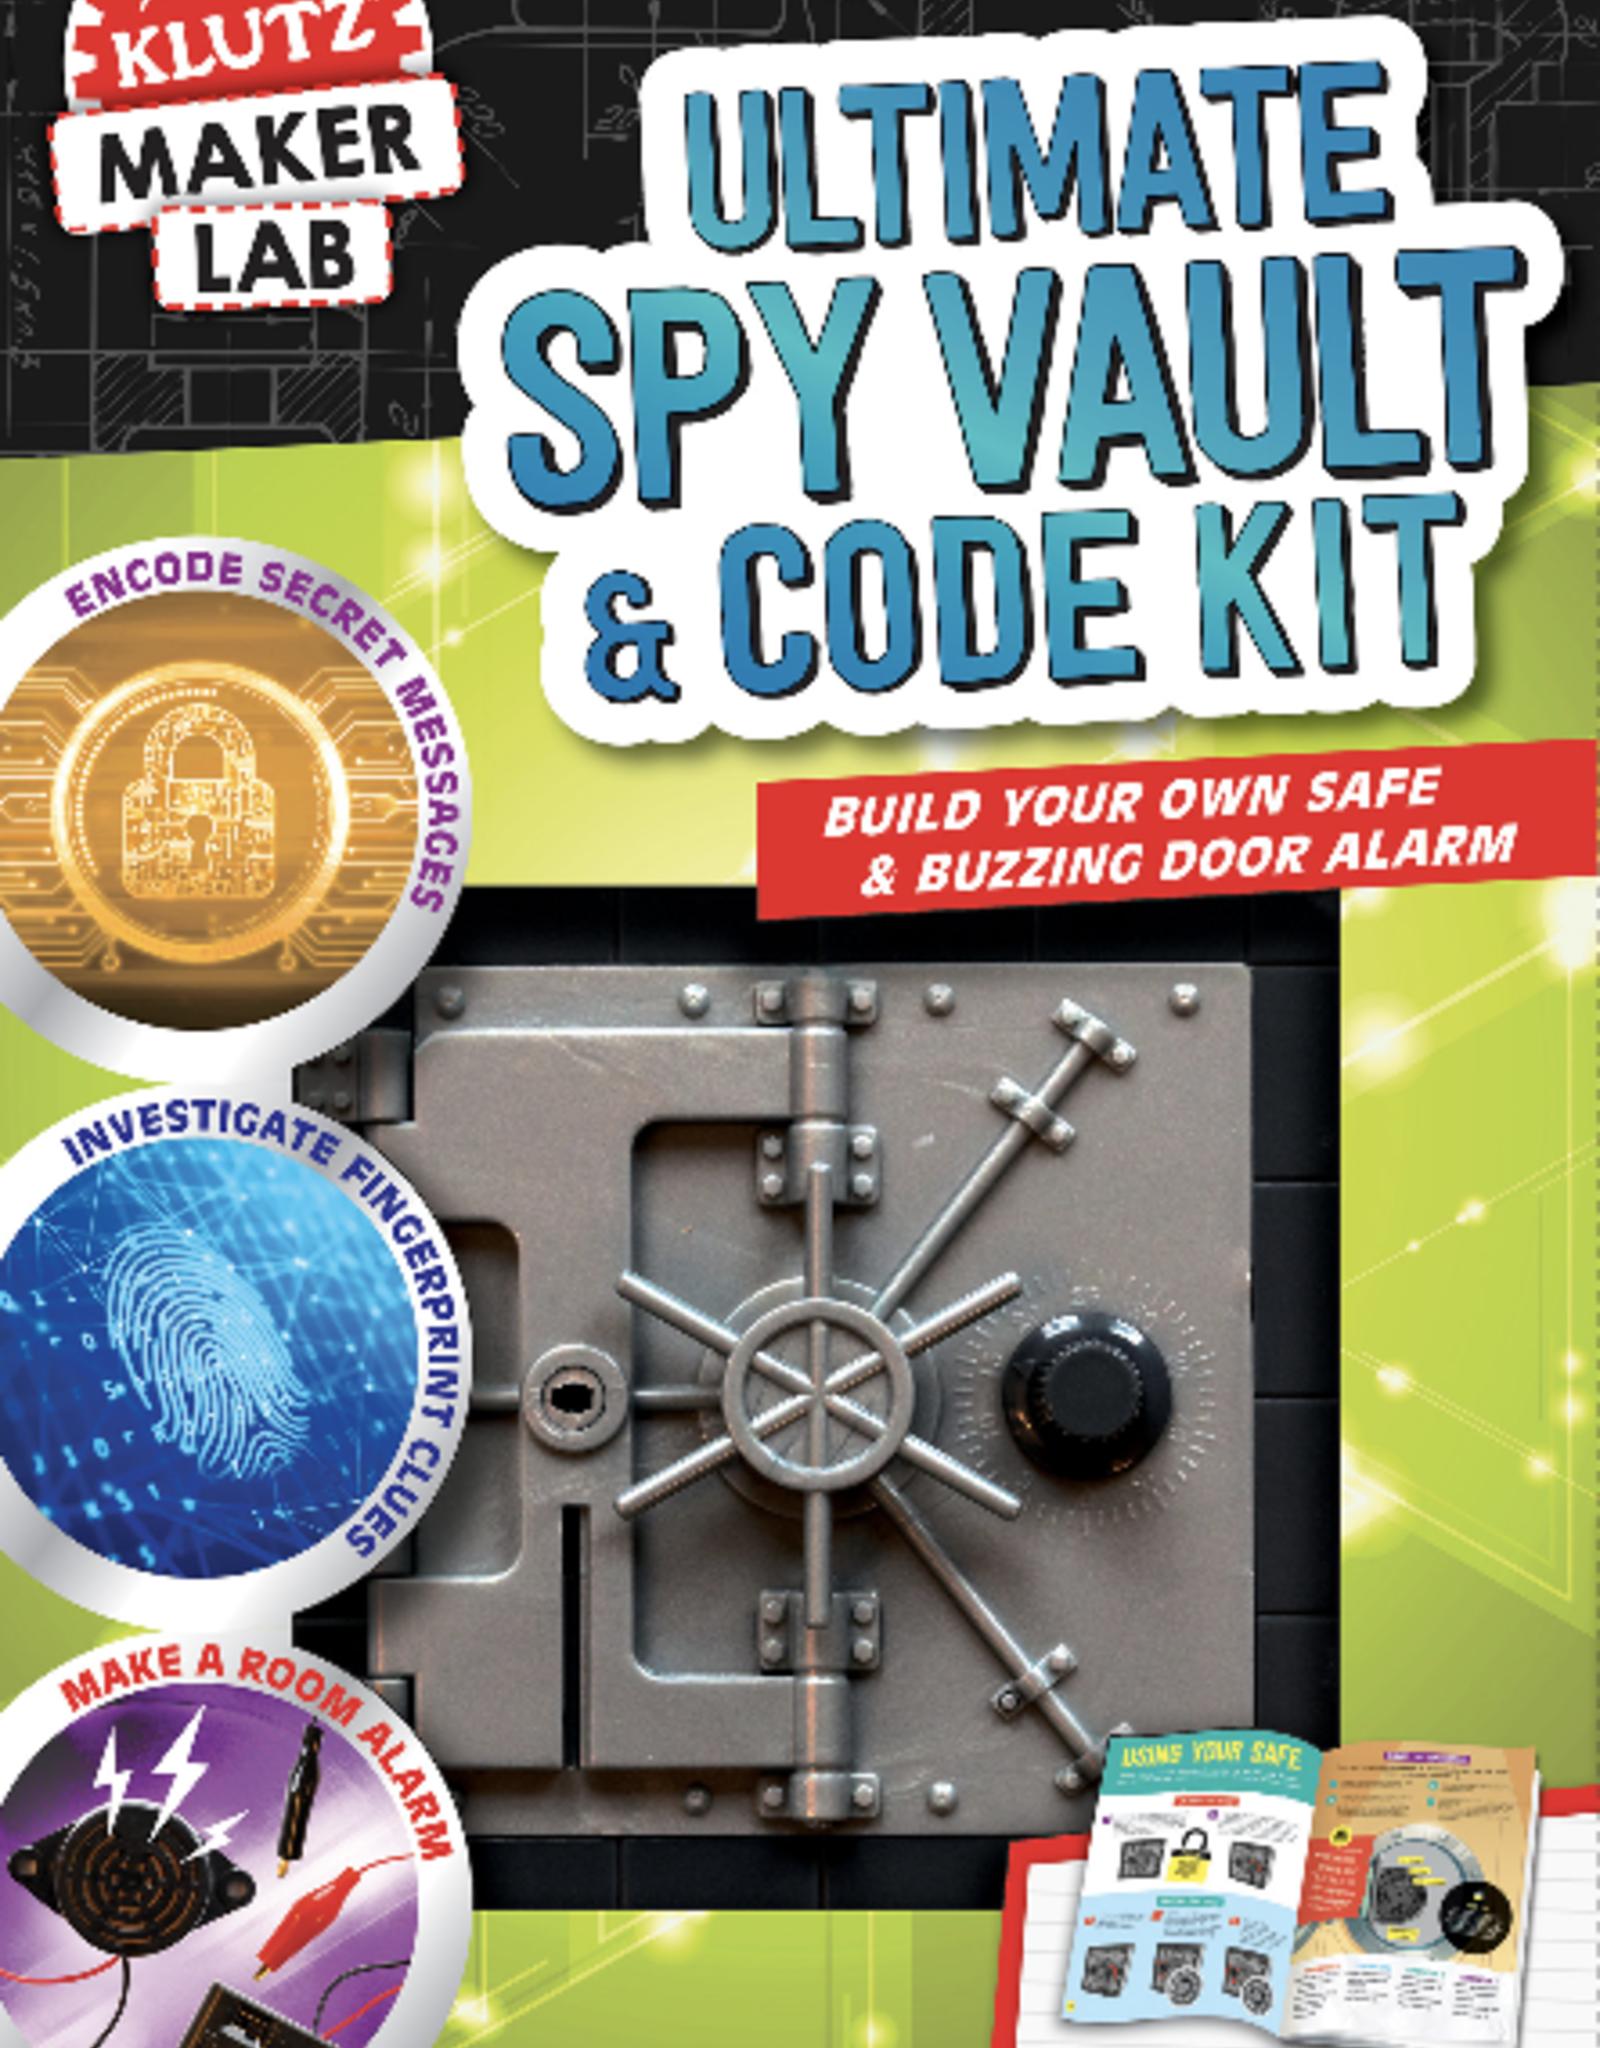 Klutz Maker Lab: Ultimate Spy Vault and Code Kit